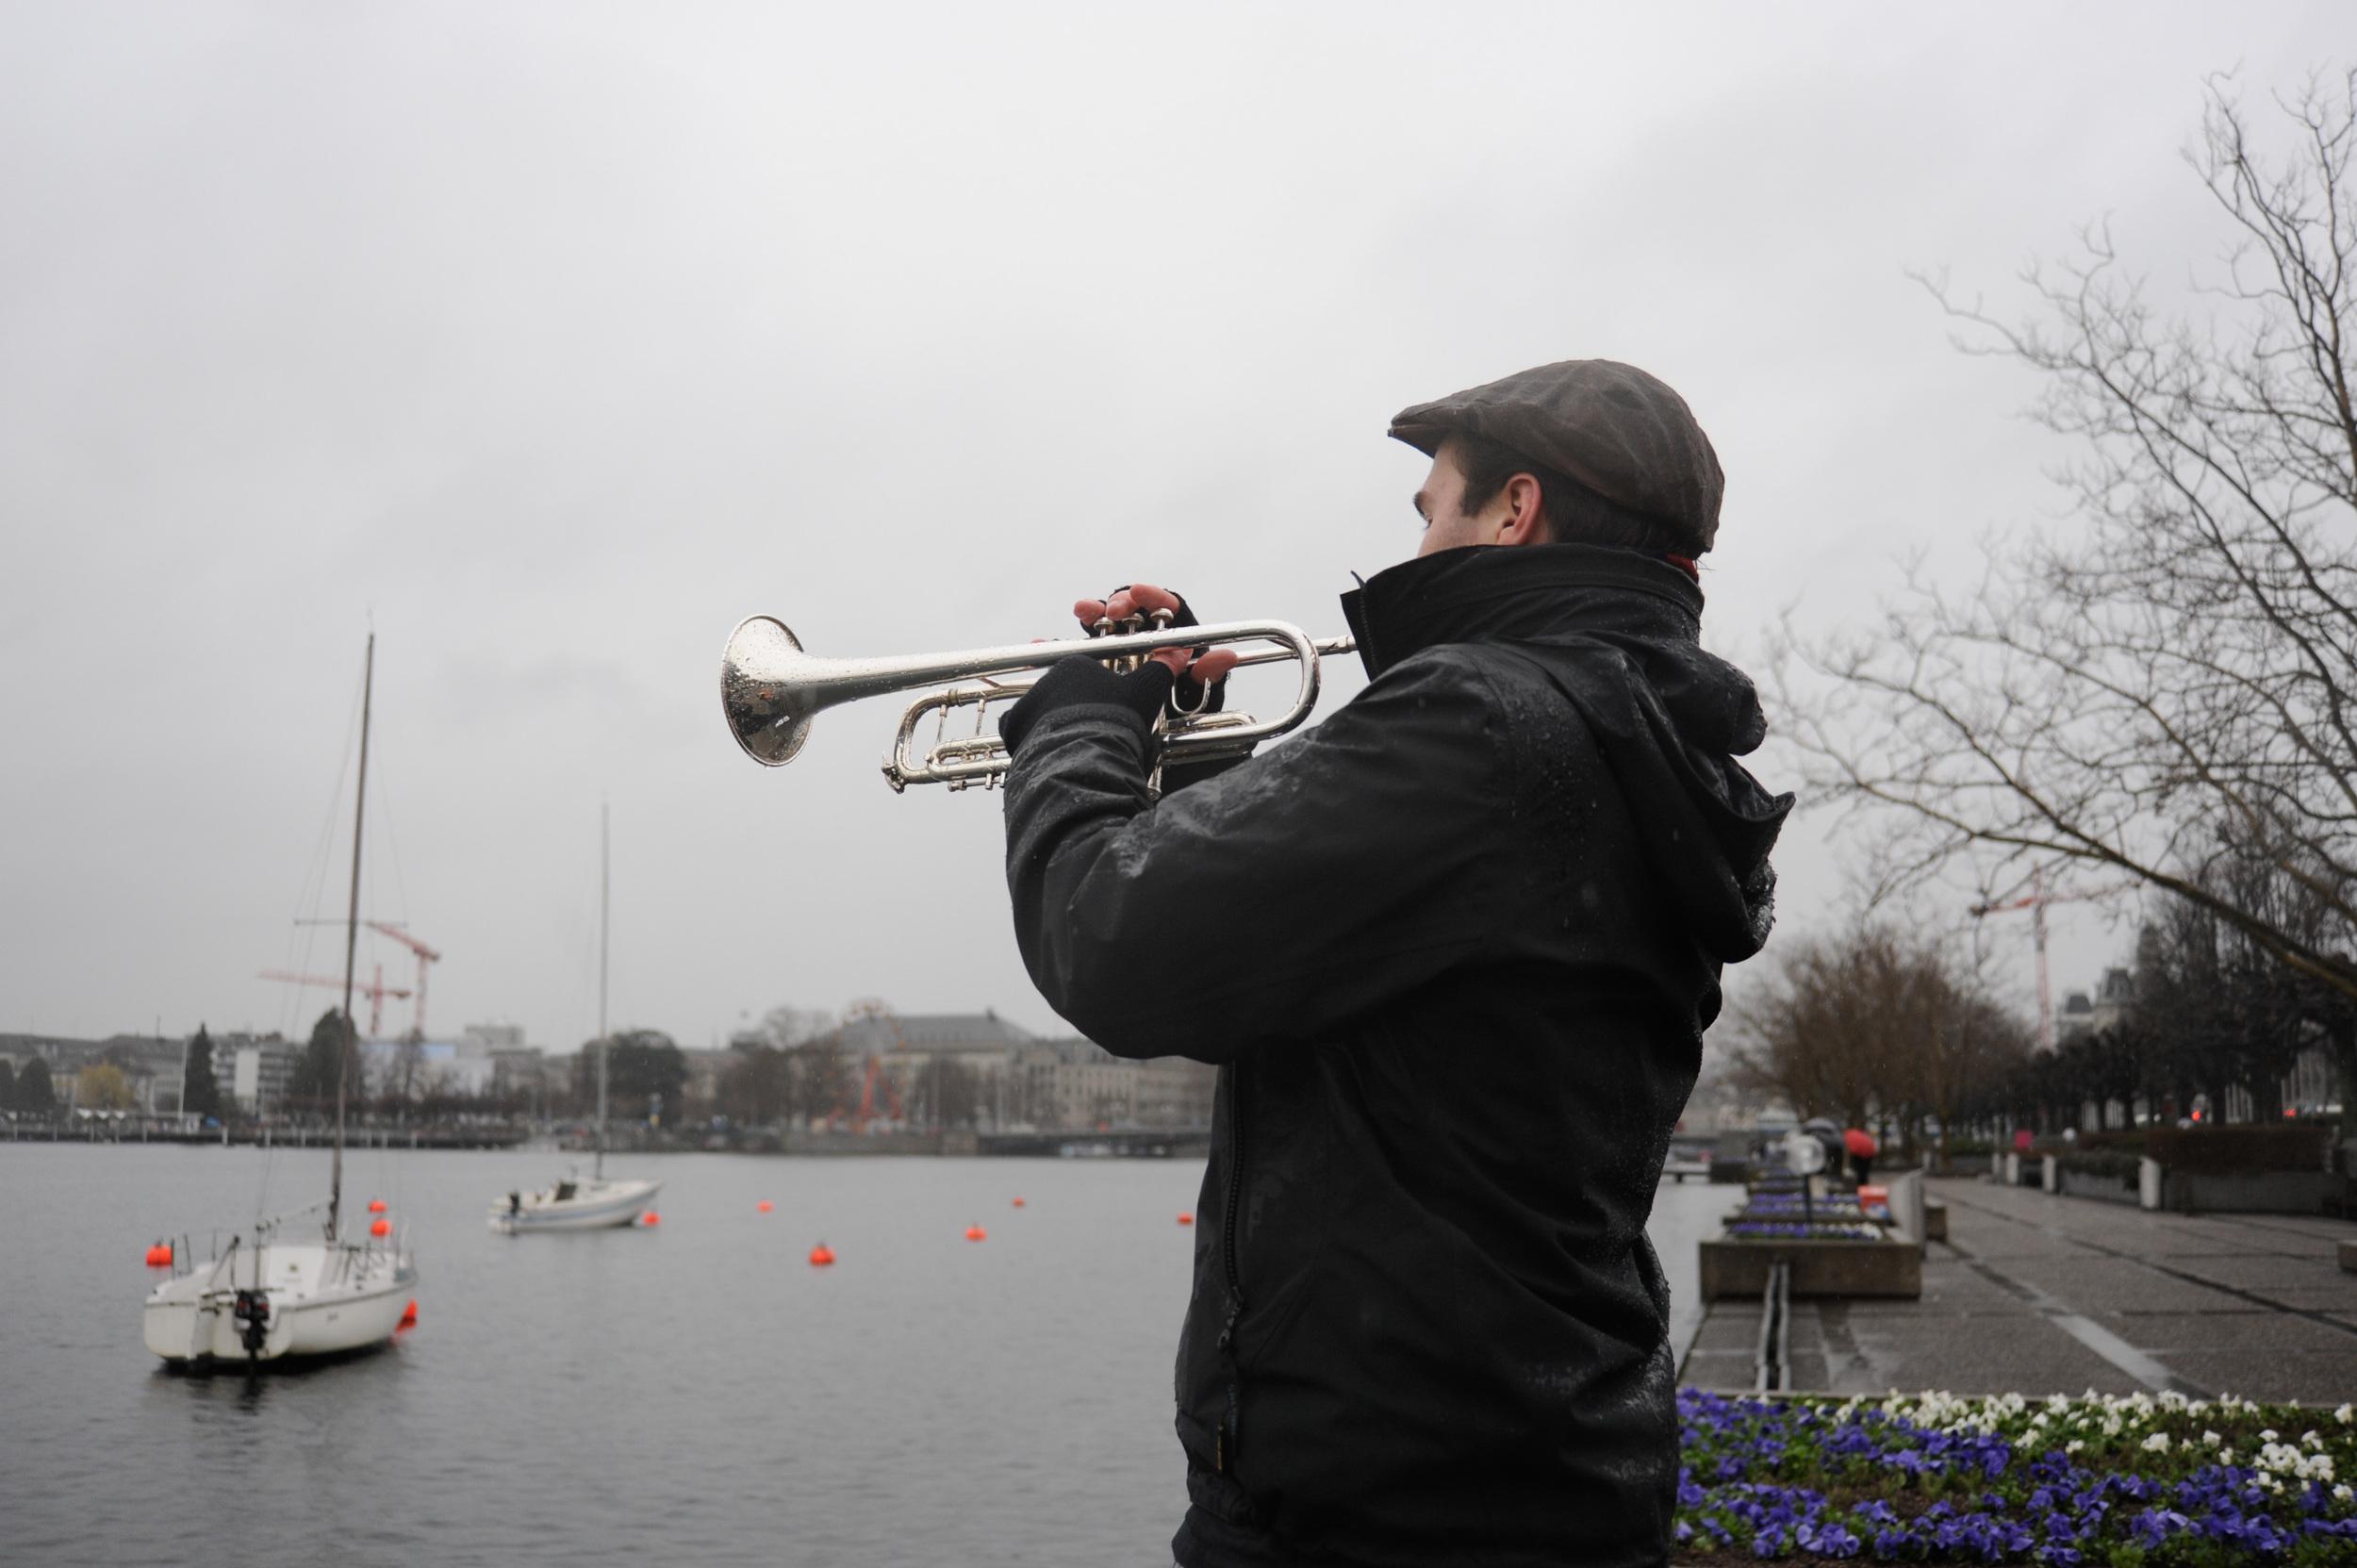 Trumpet City: Zurich  Photo by Palma Fiacco